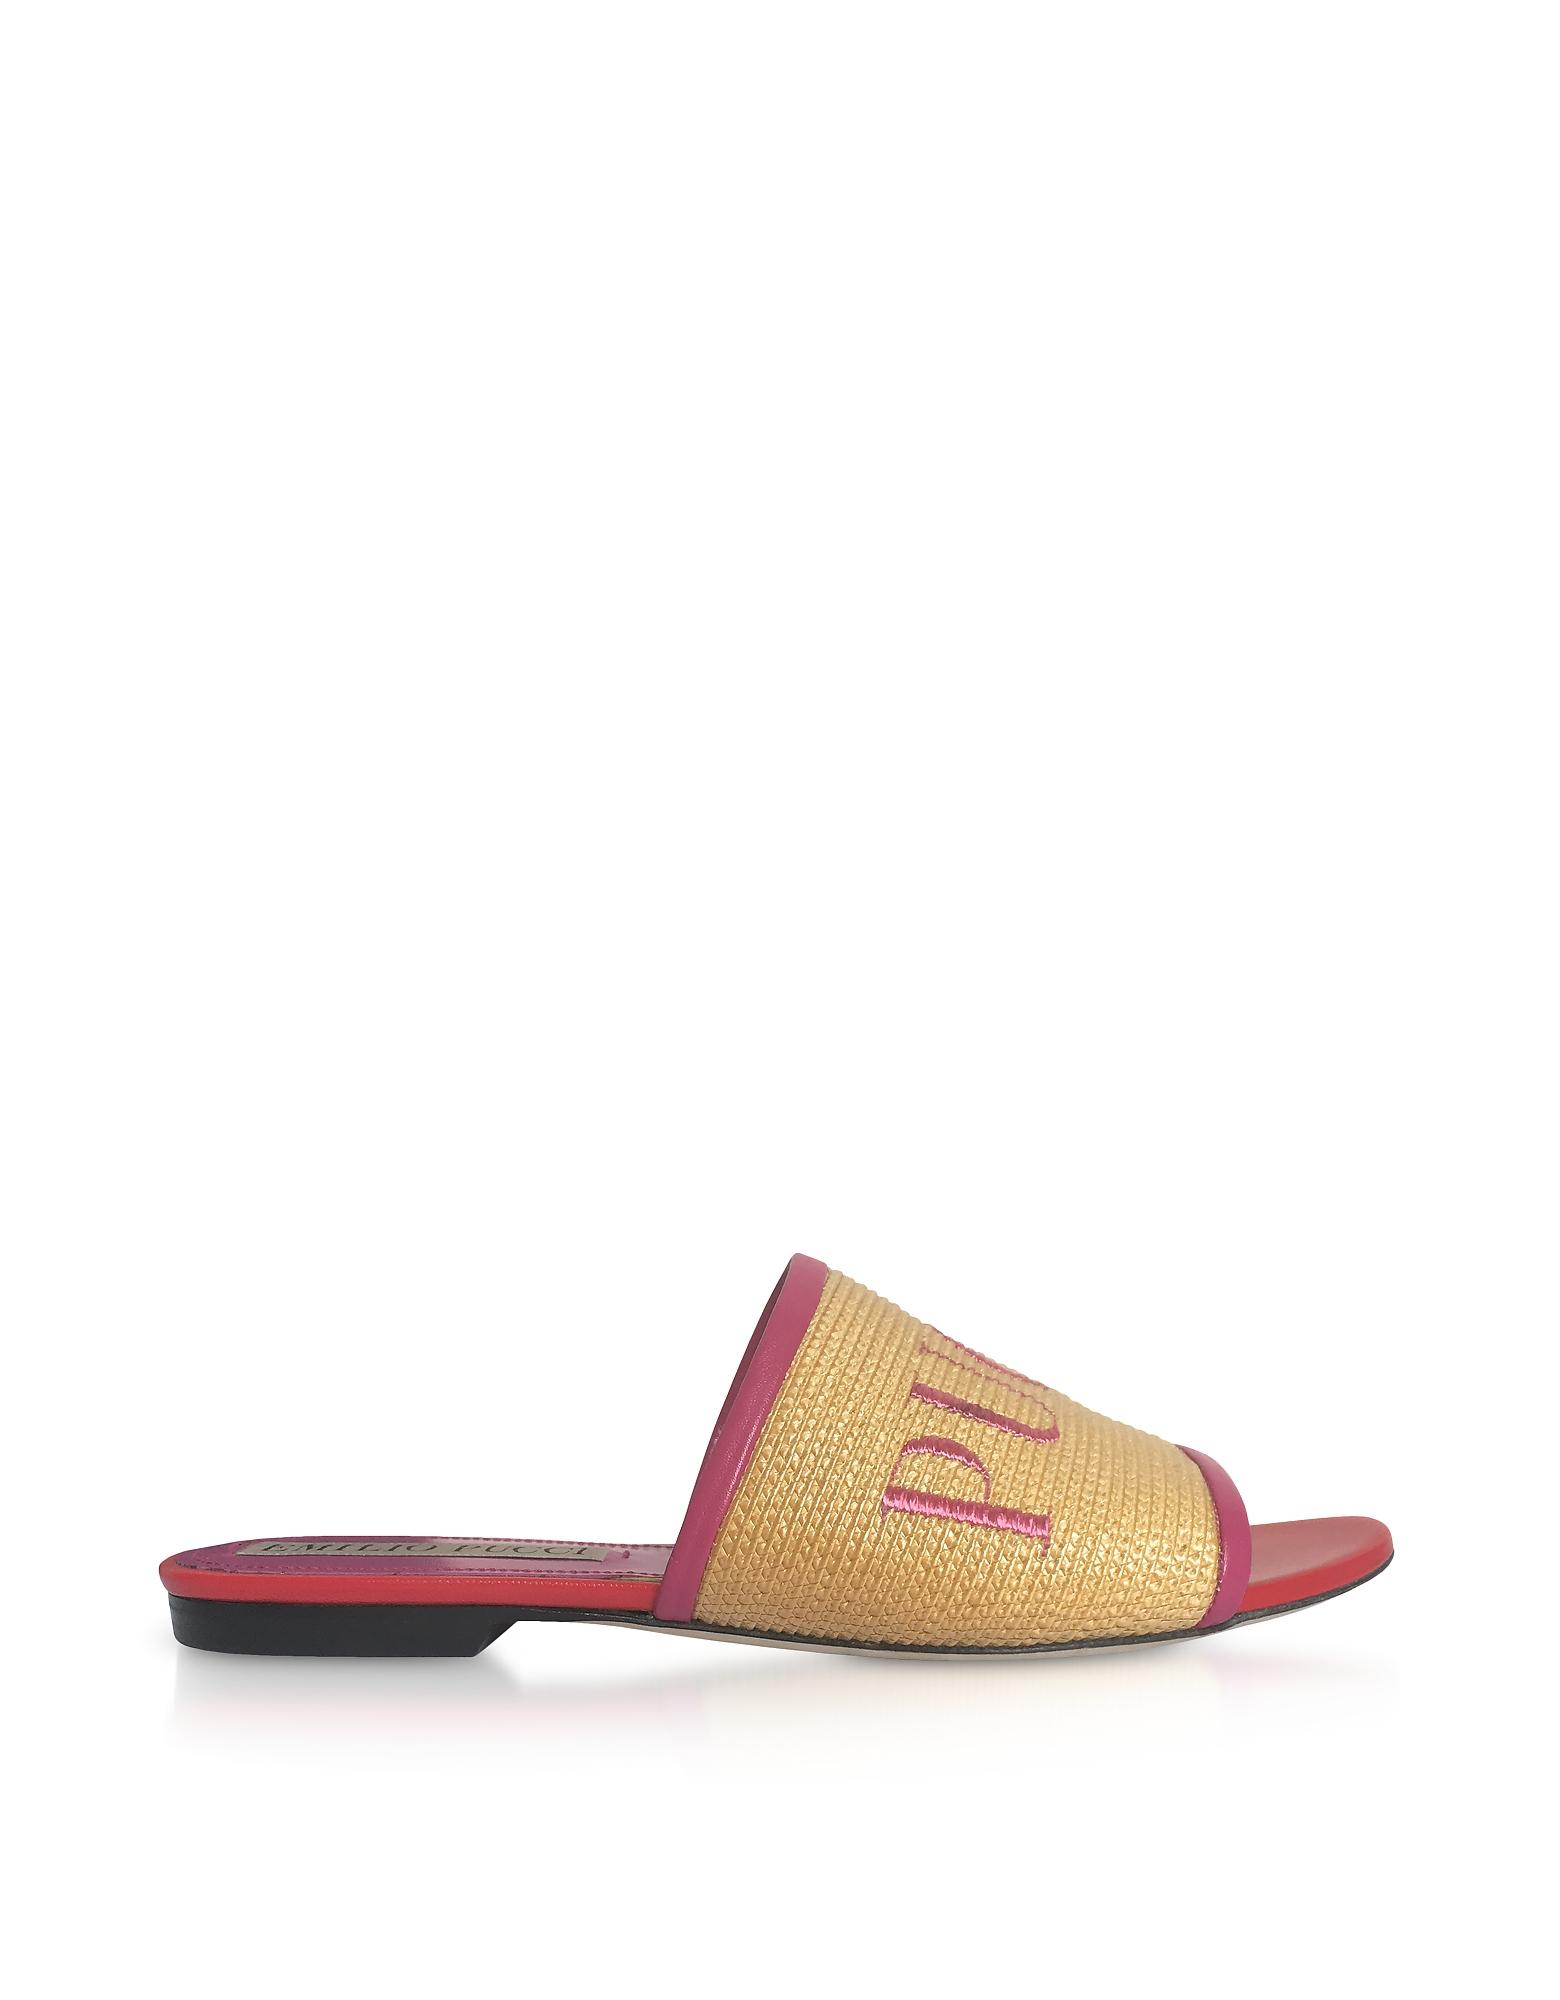 Emilio Pucci Shoes, Raffia & Leather Slipper w/Embroidered Logo